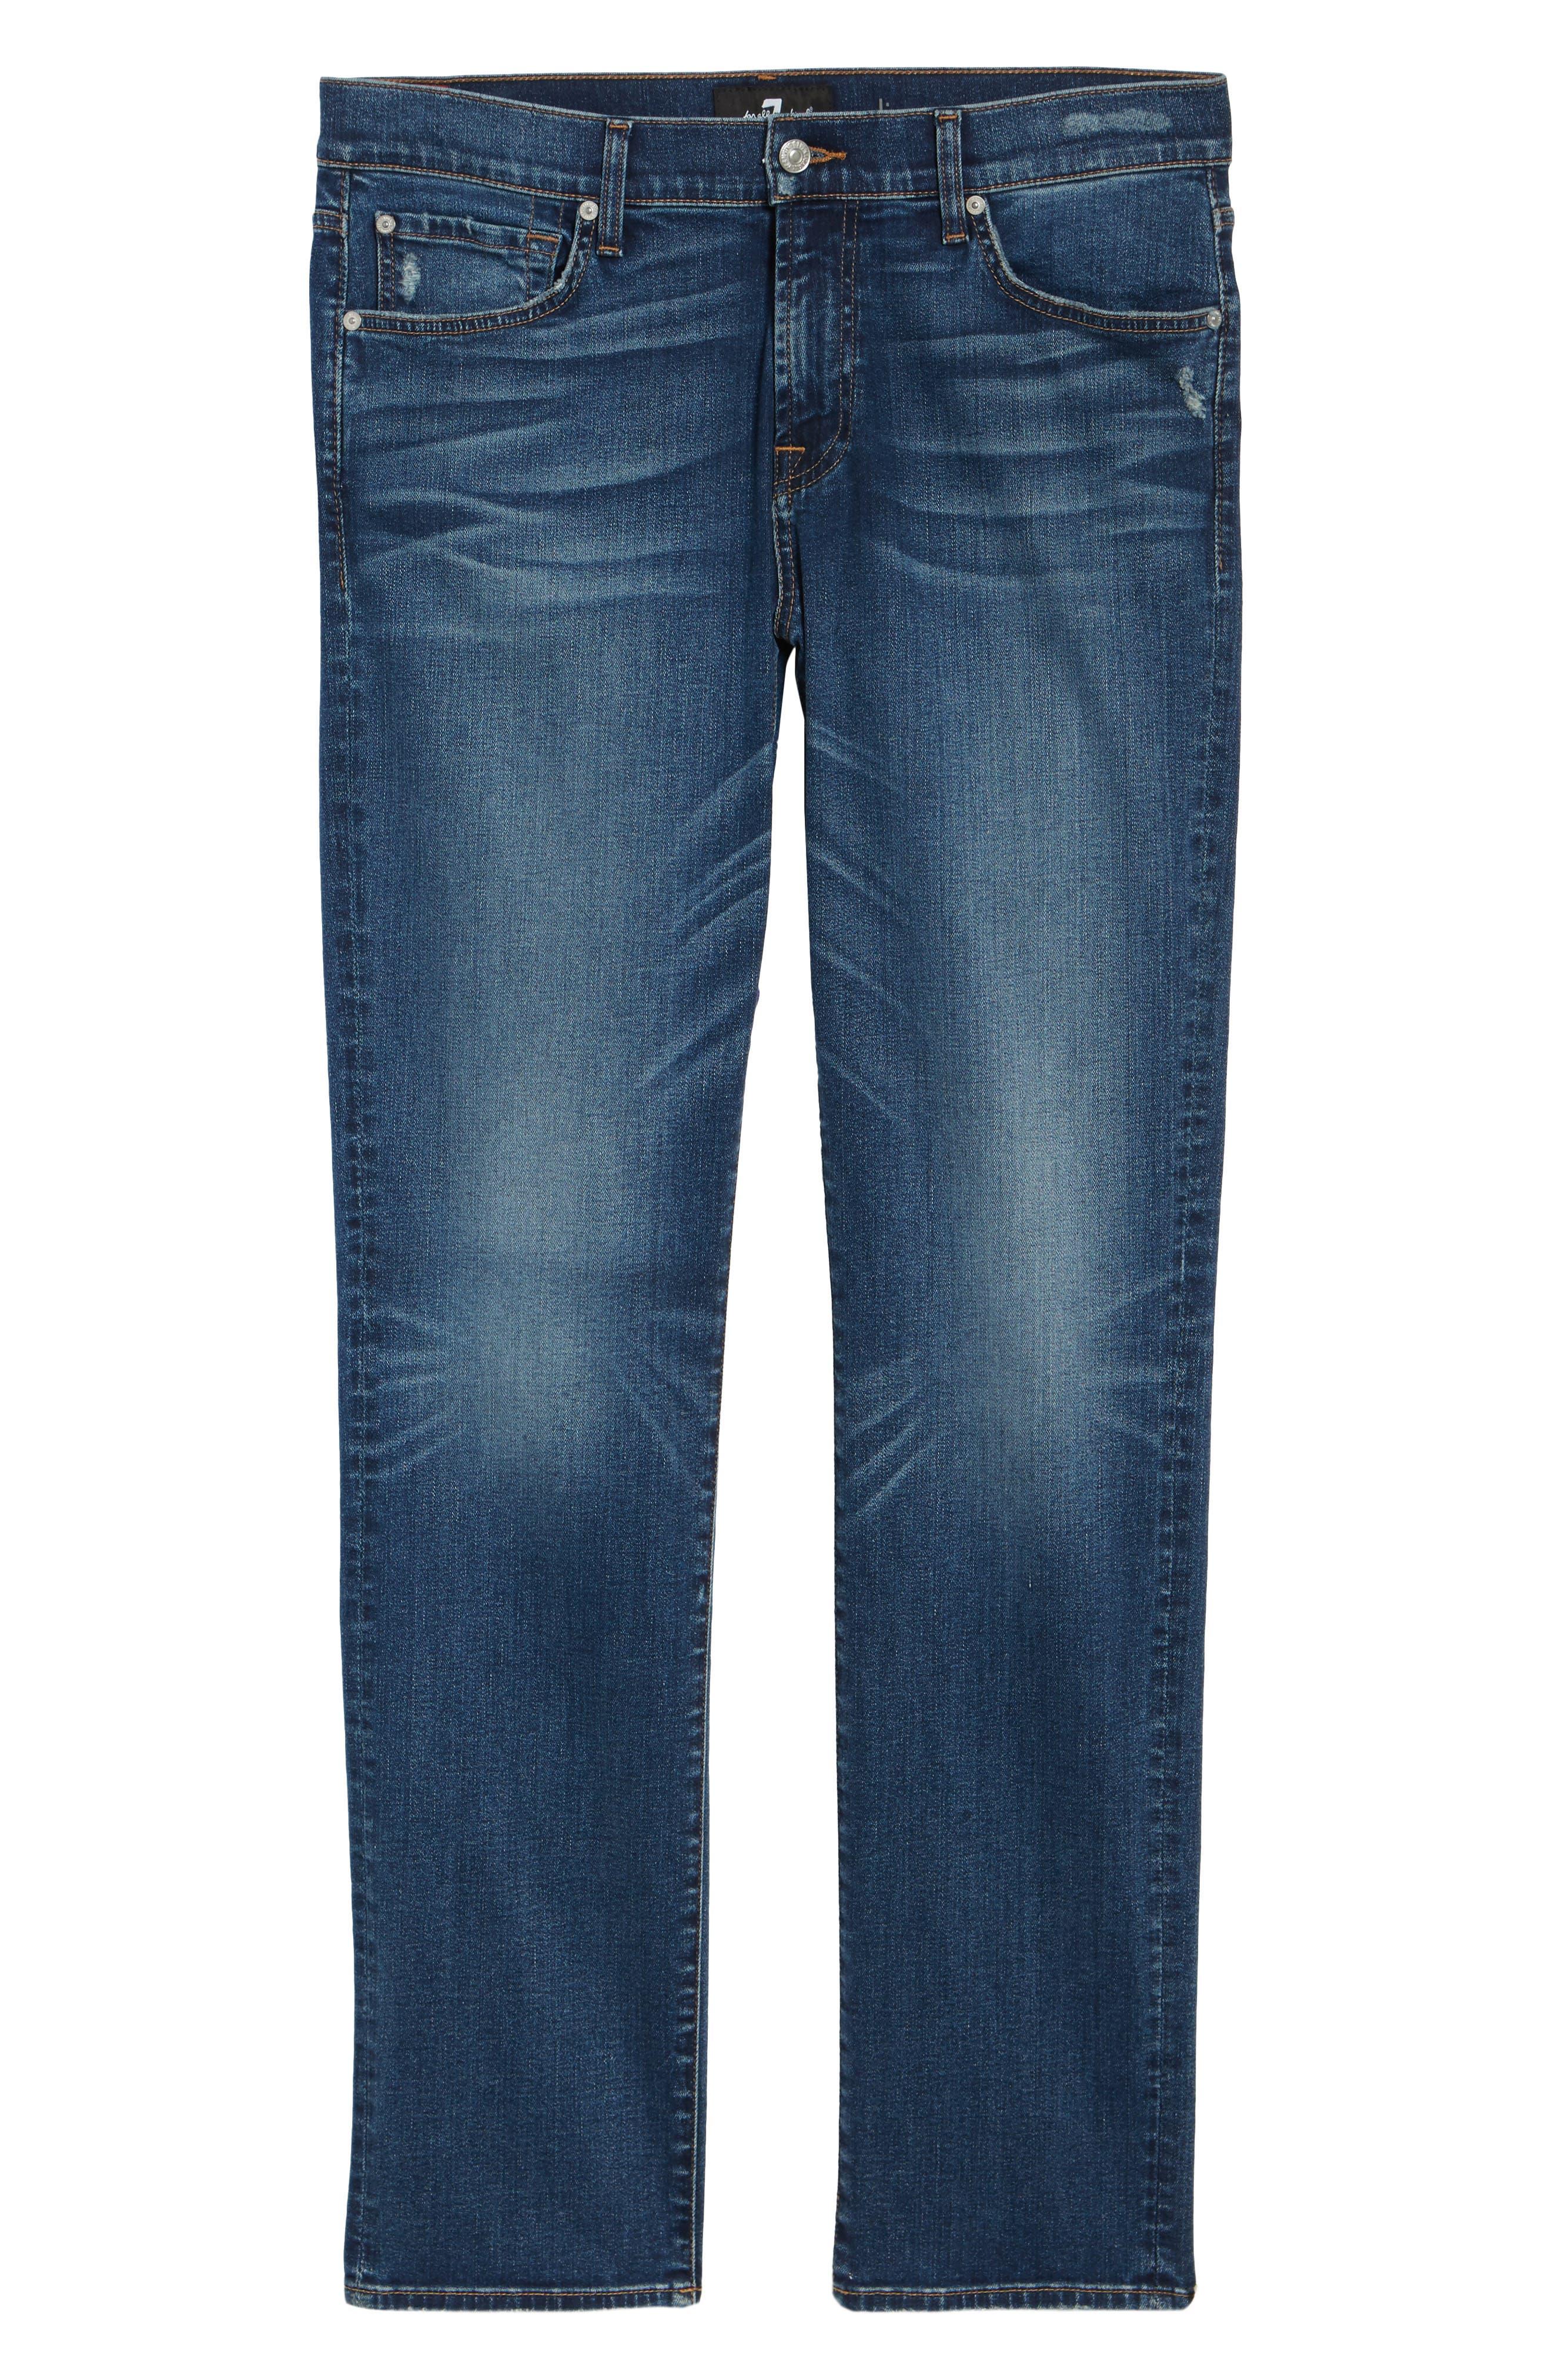 Slimmy Slim Fit Jeans,                             Alternate thumbnail 6, color,                             407